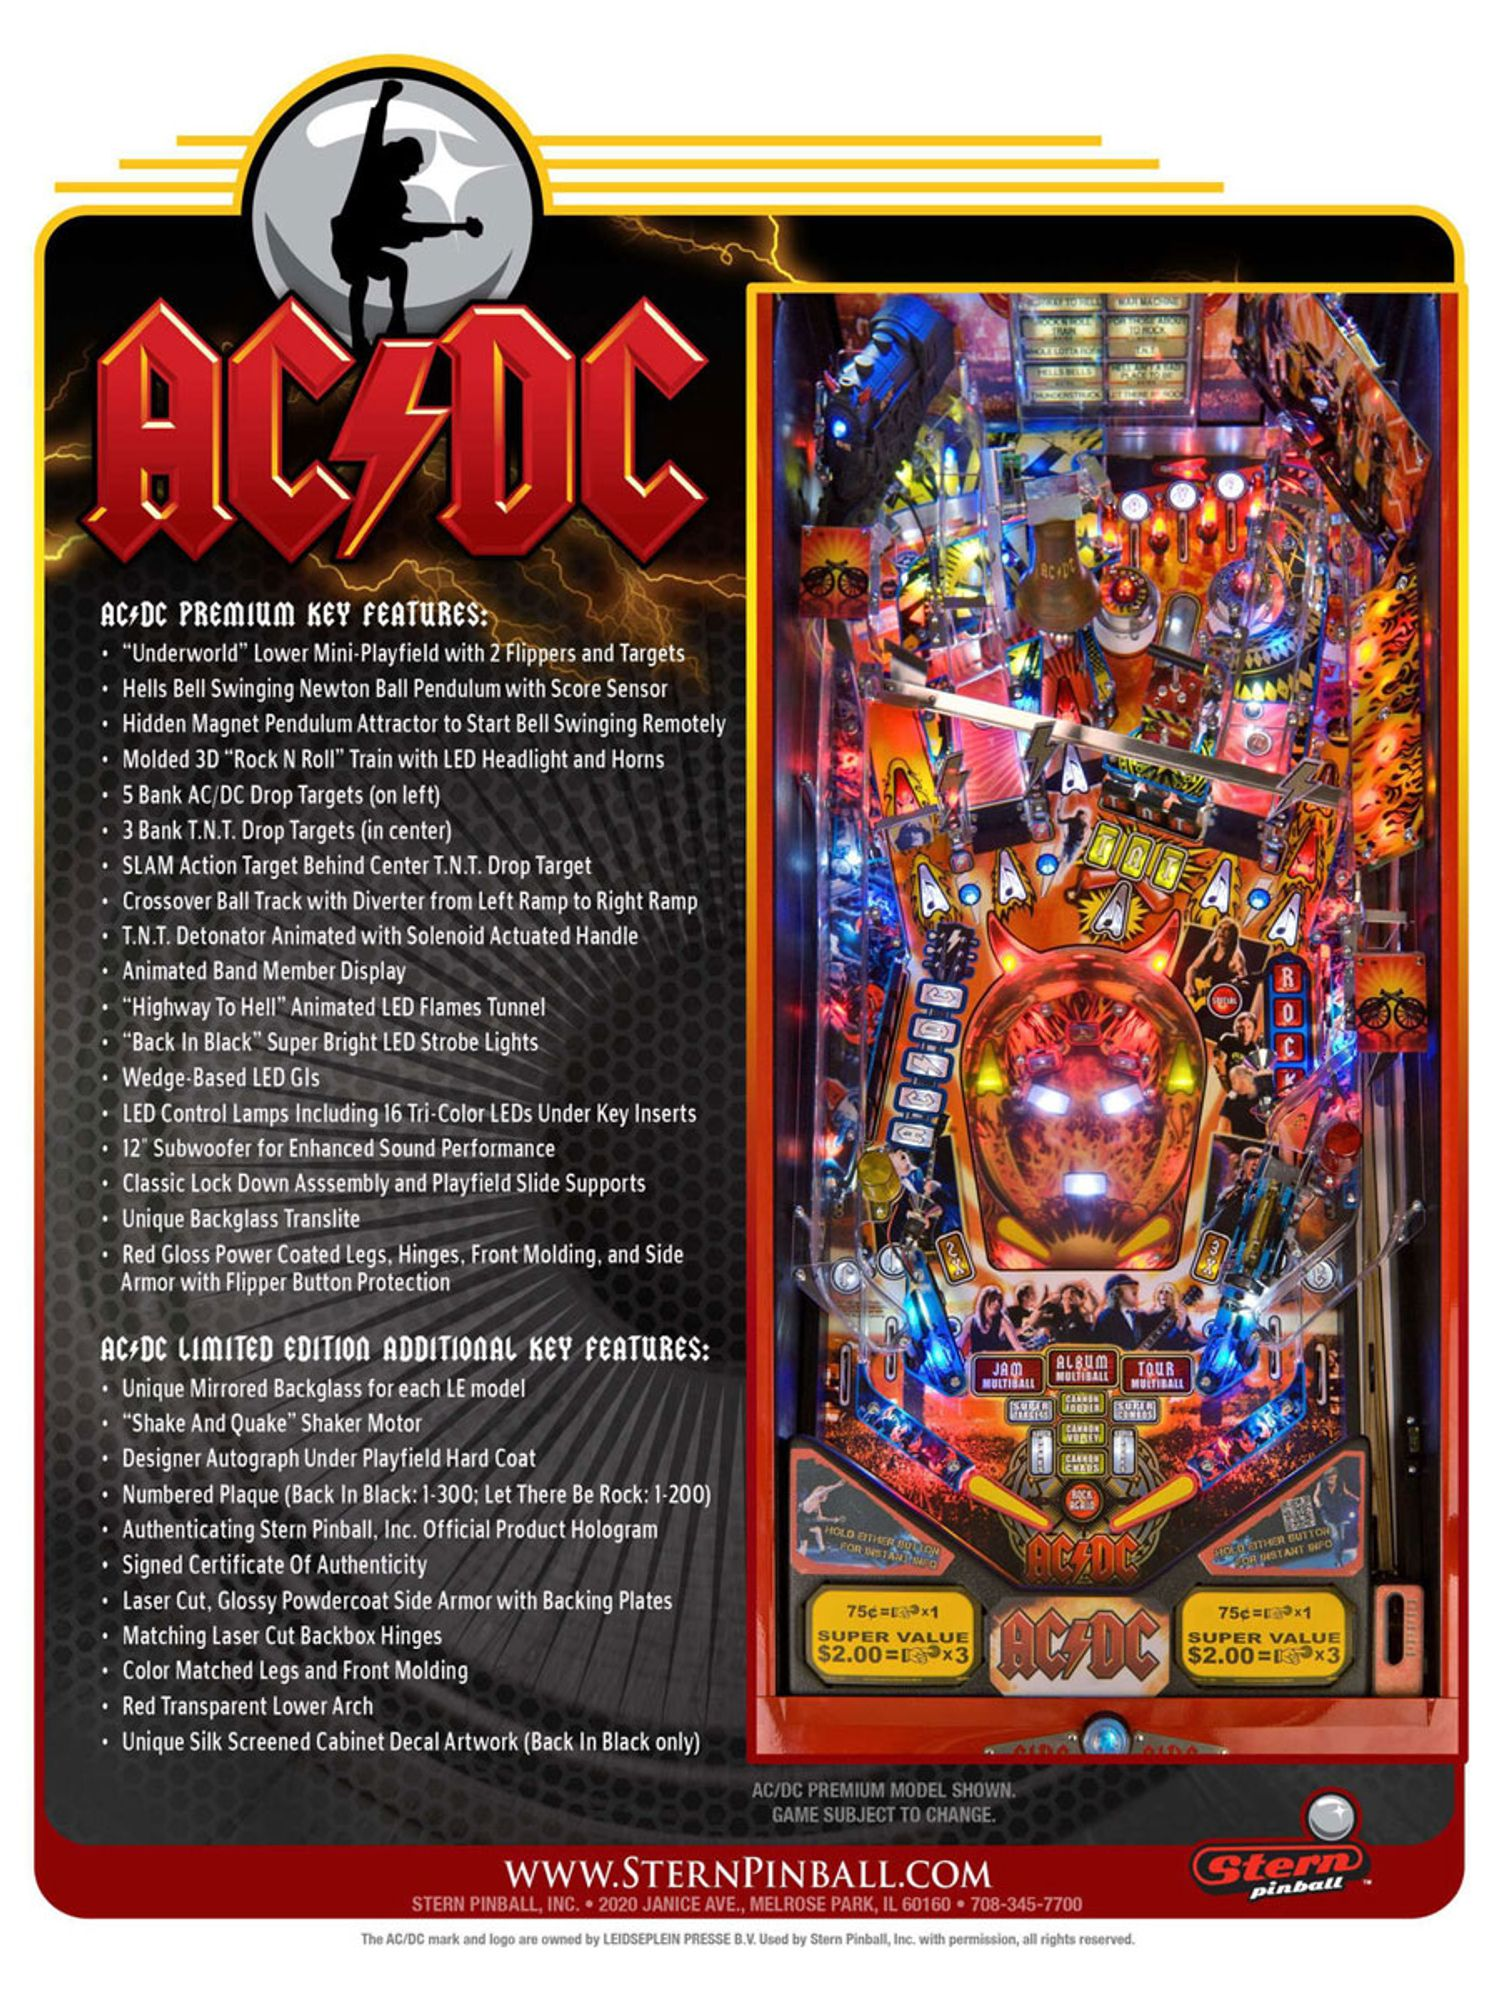 AC/DC Flyer 2